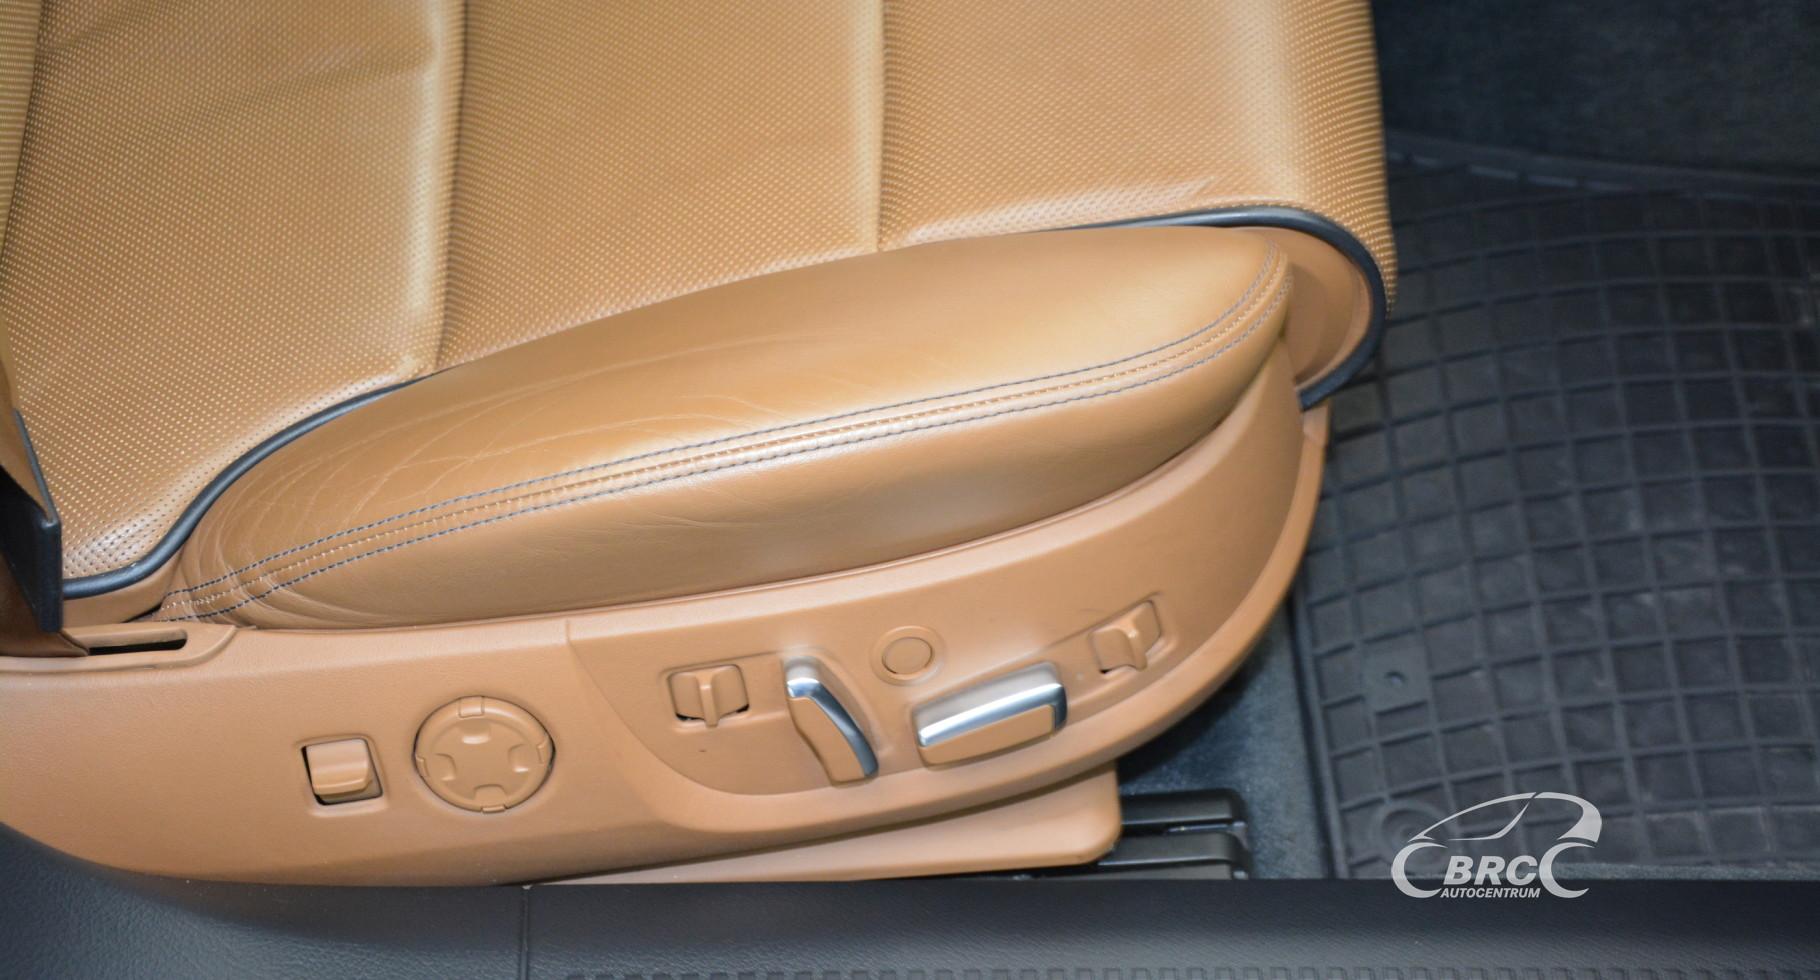 Audi A8 L 4.2 Quattro